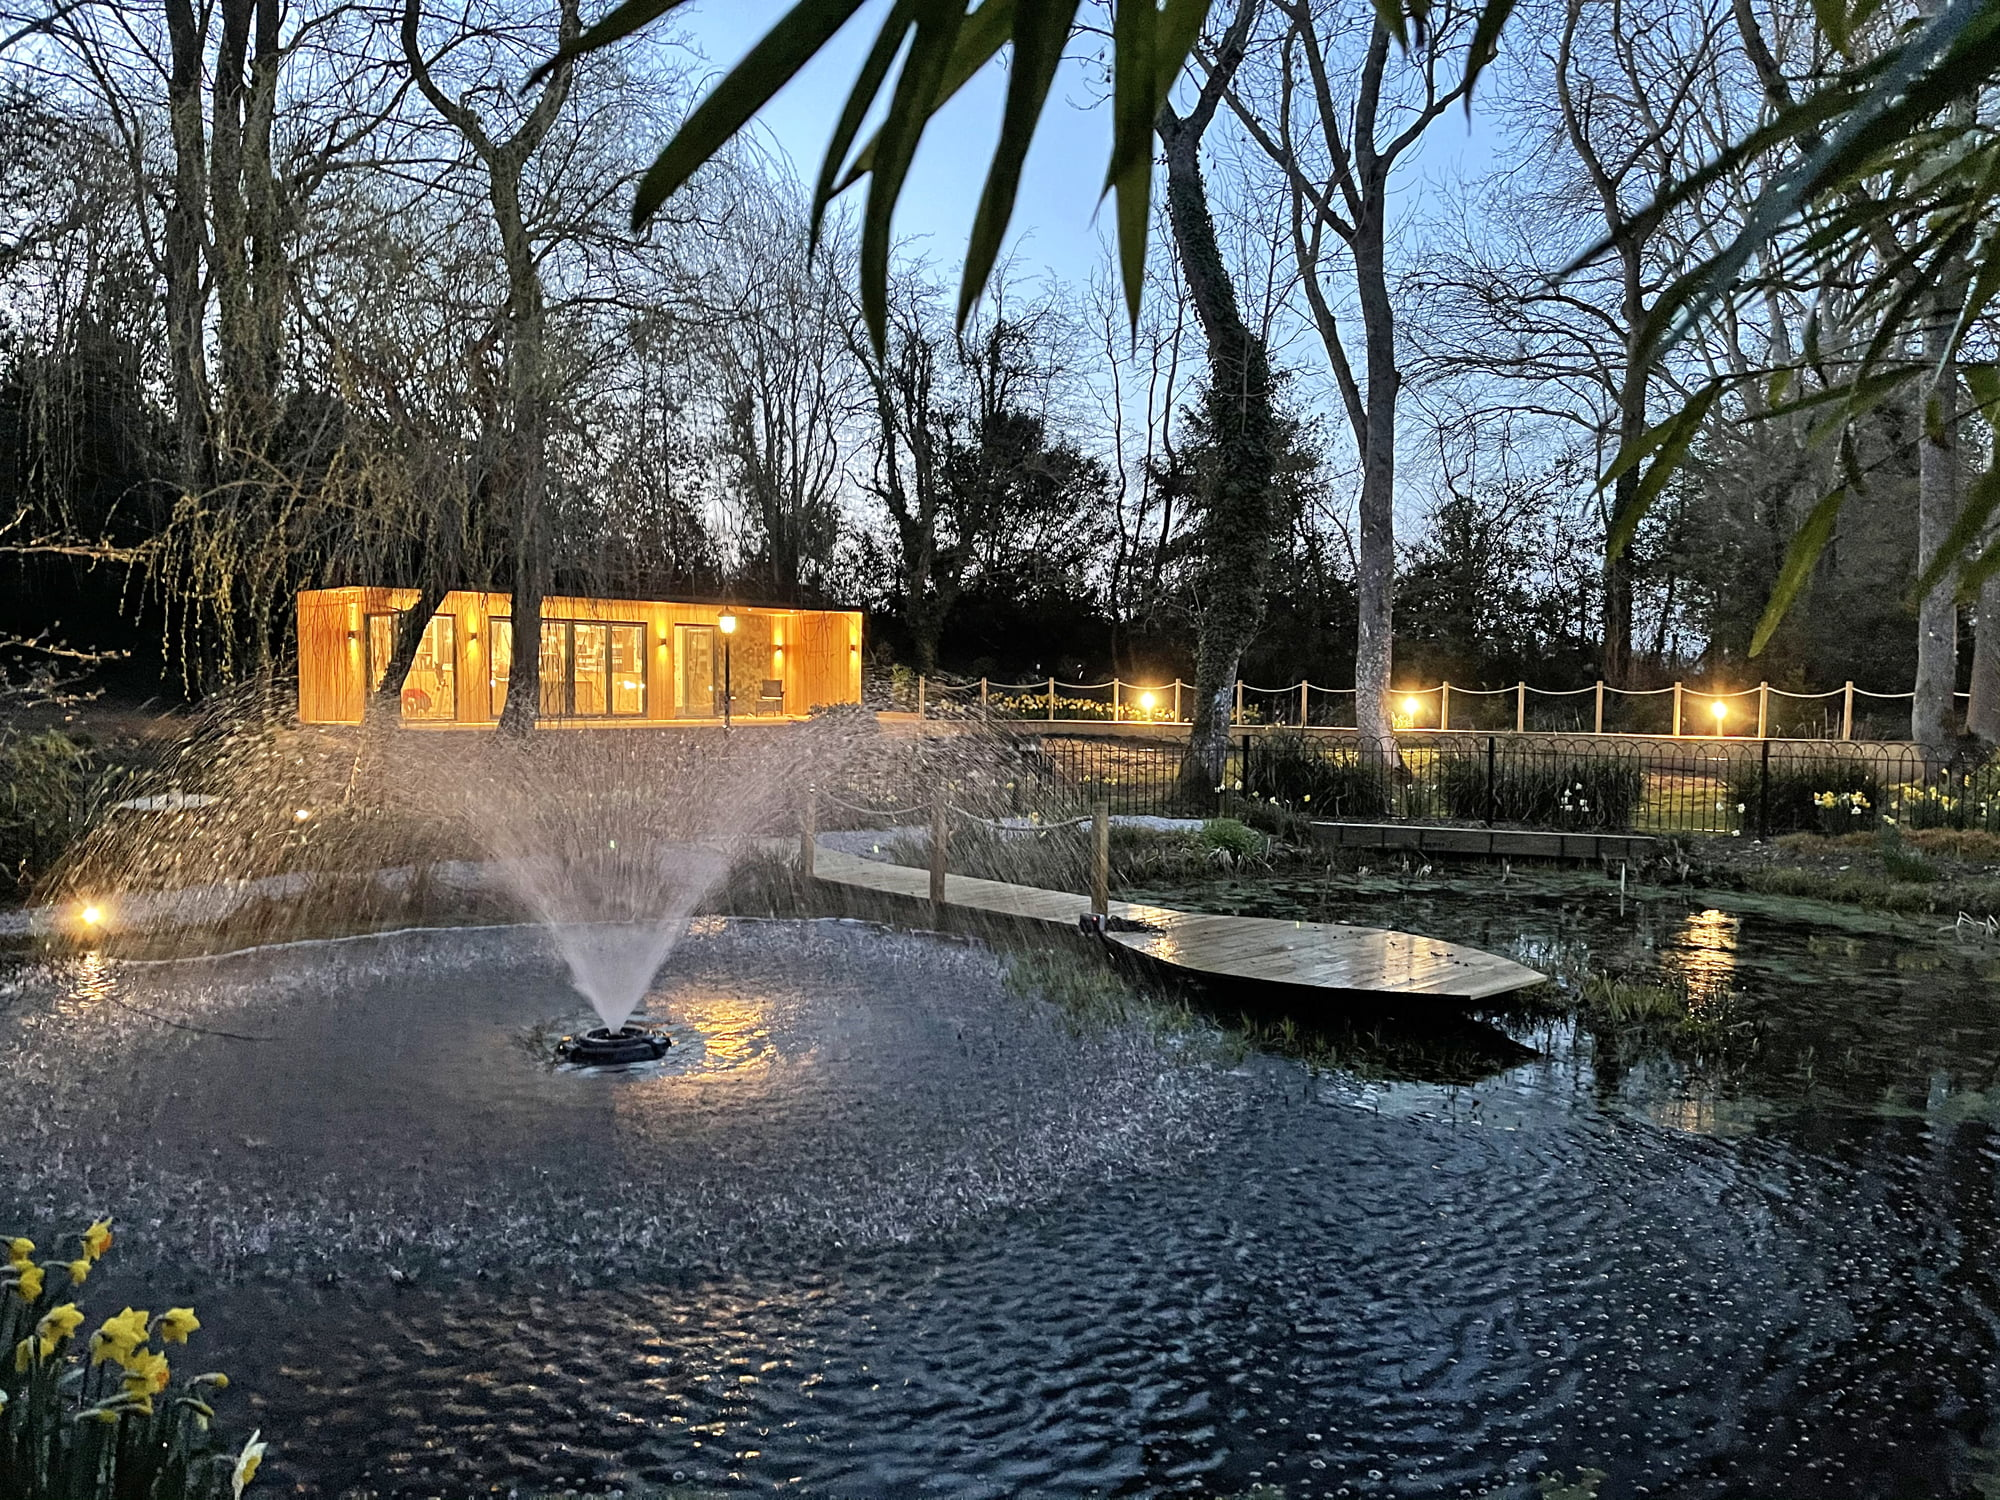 Garden office by pond fountain